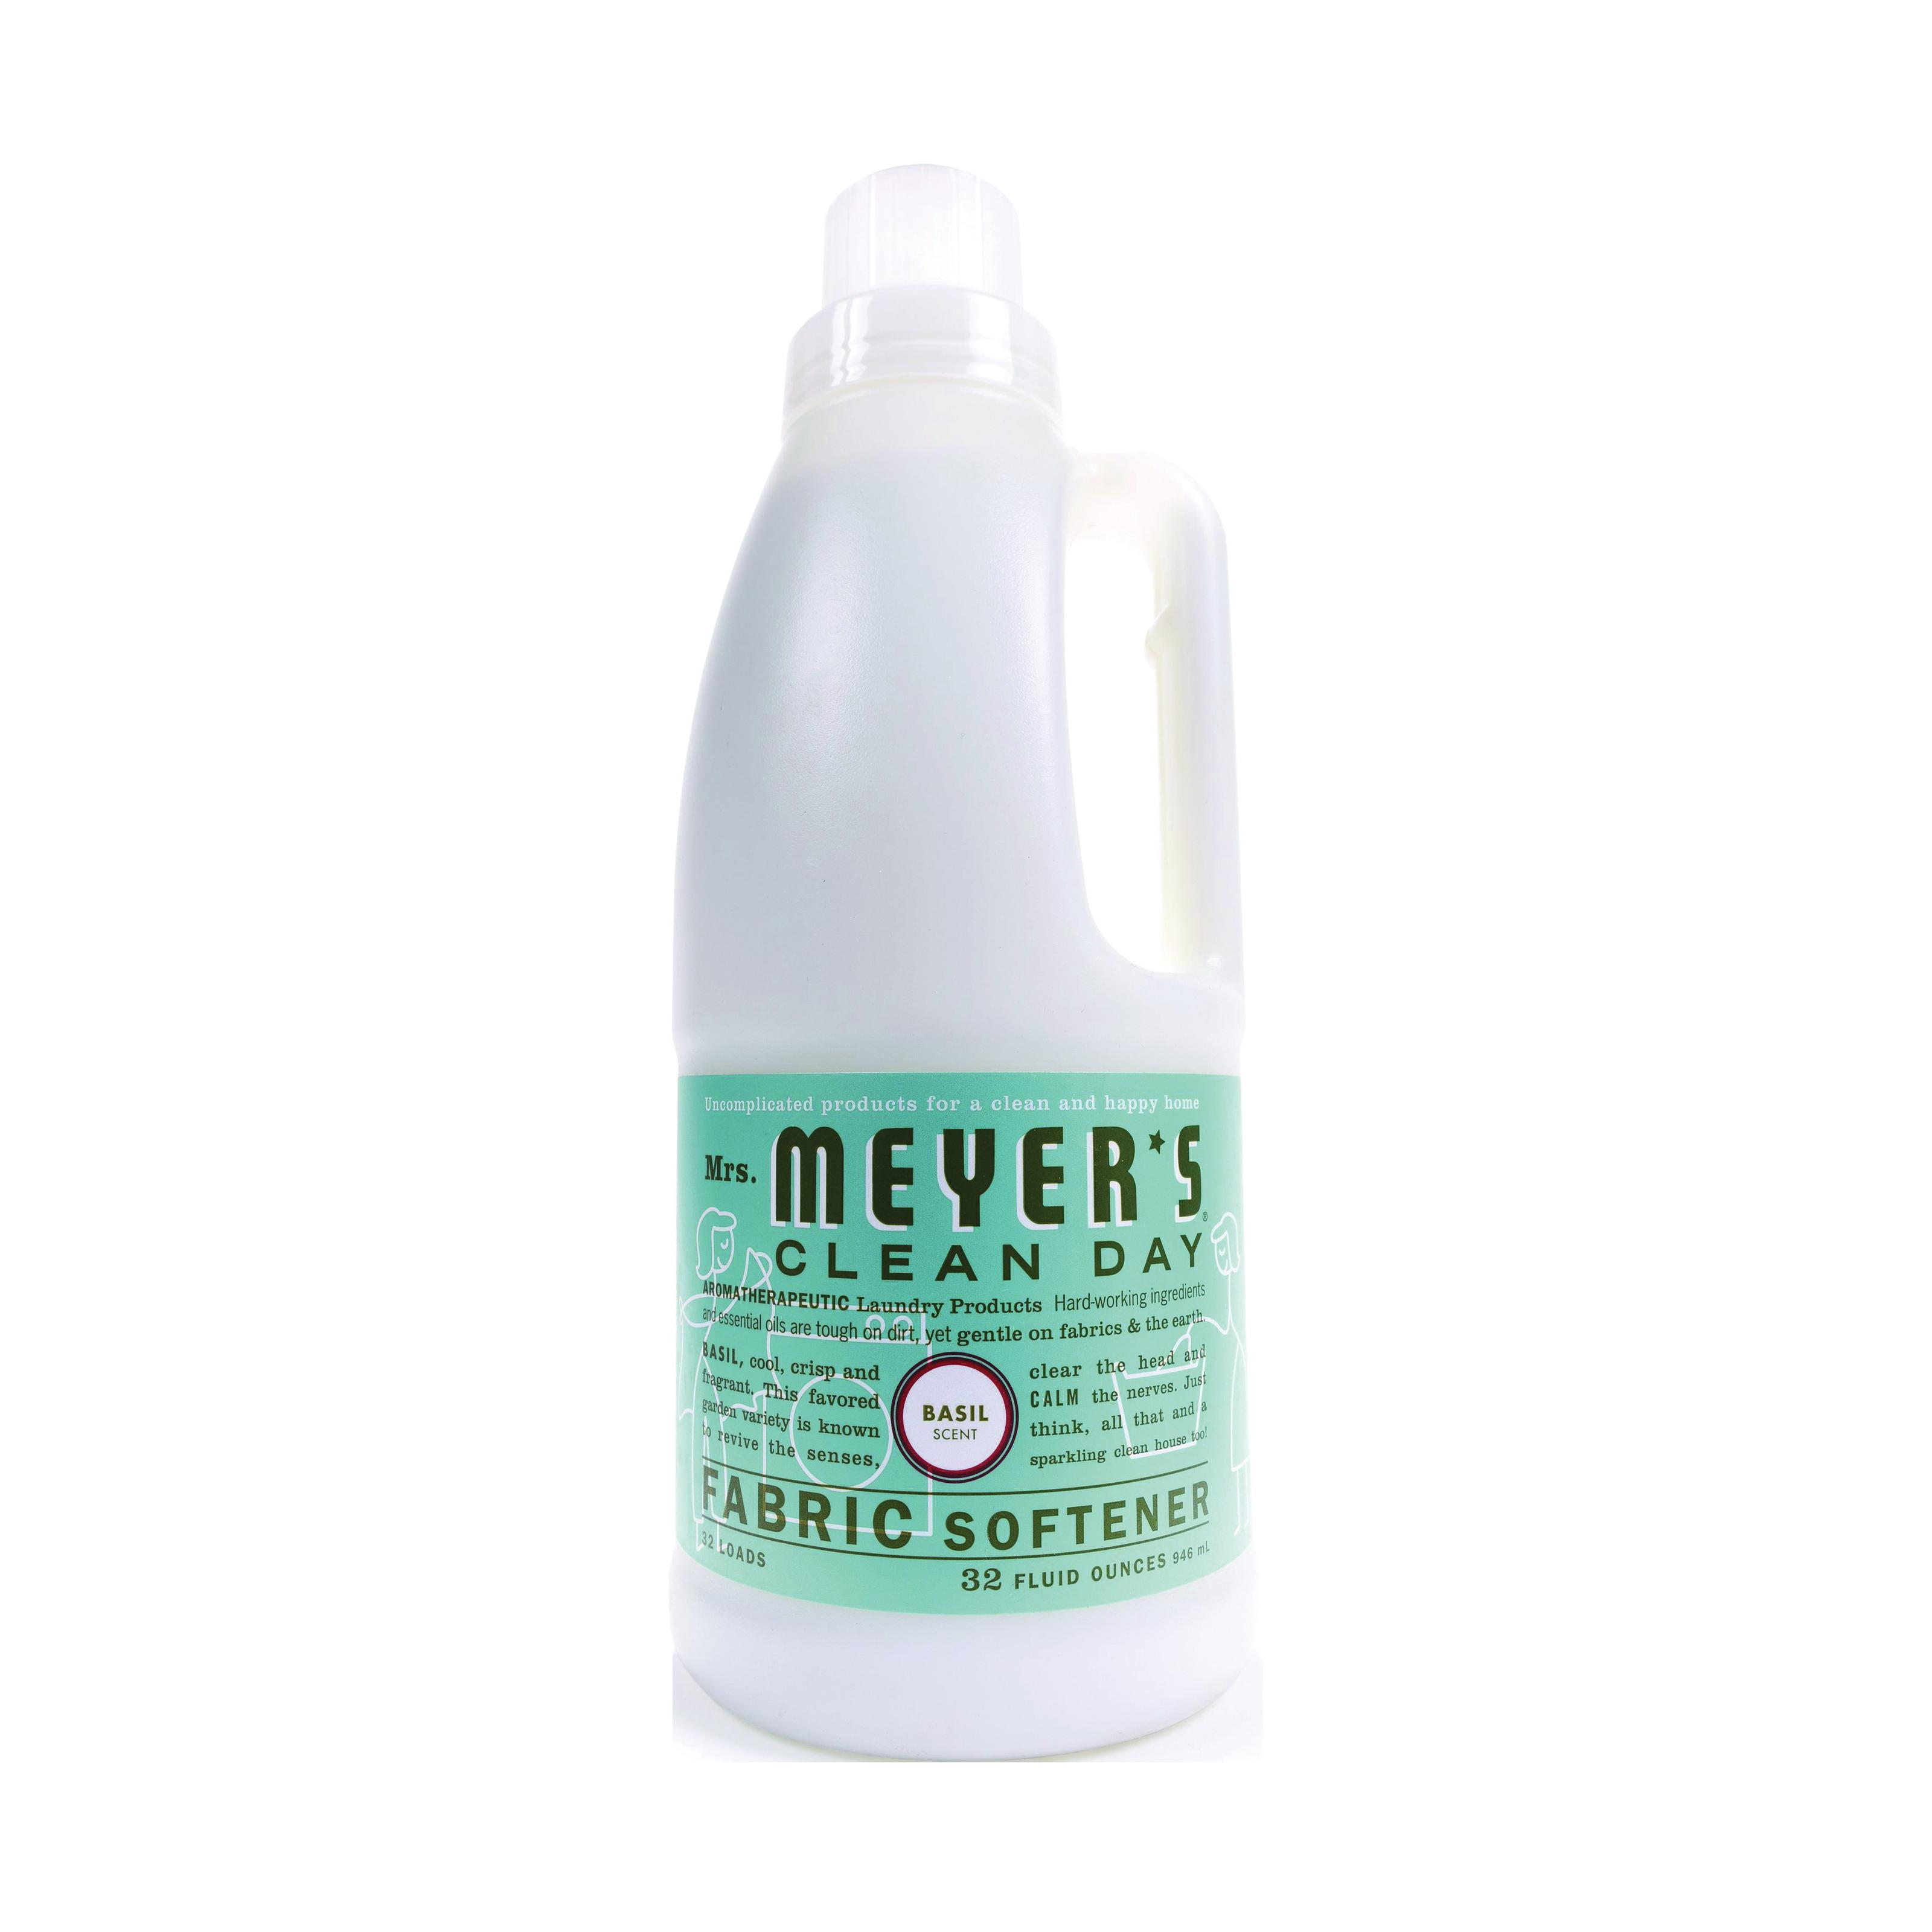 Picture of Mrs. Meyer's 014334 Fabric Softener, 32 oz Package, Bottle, Liquid, Basil